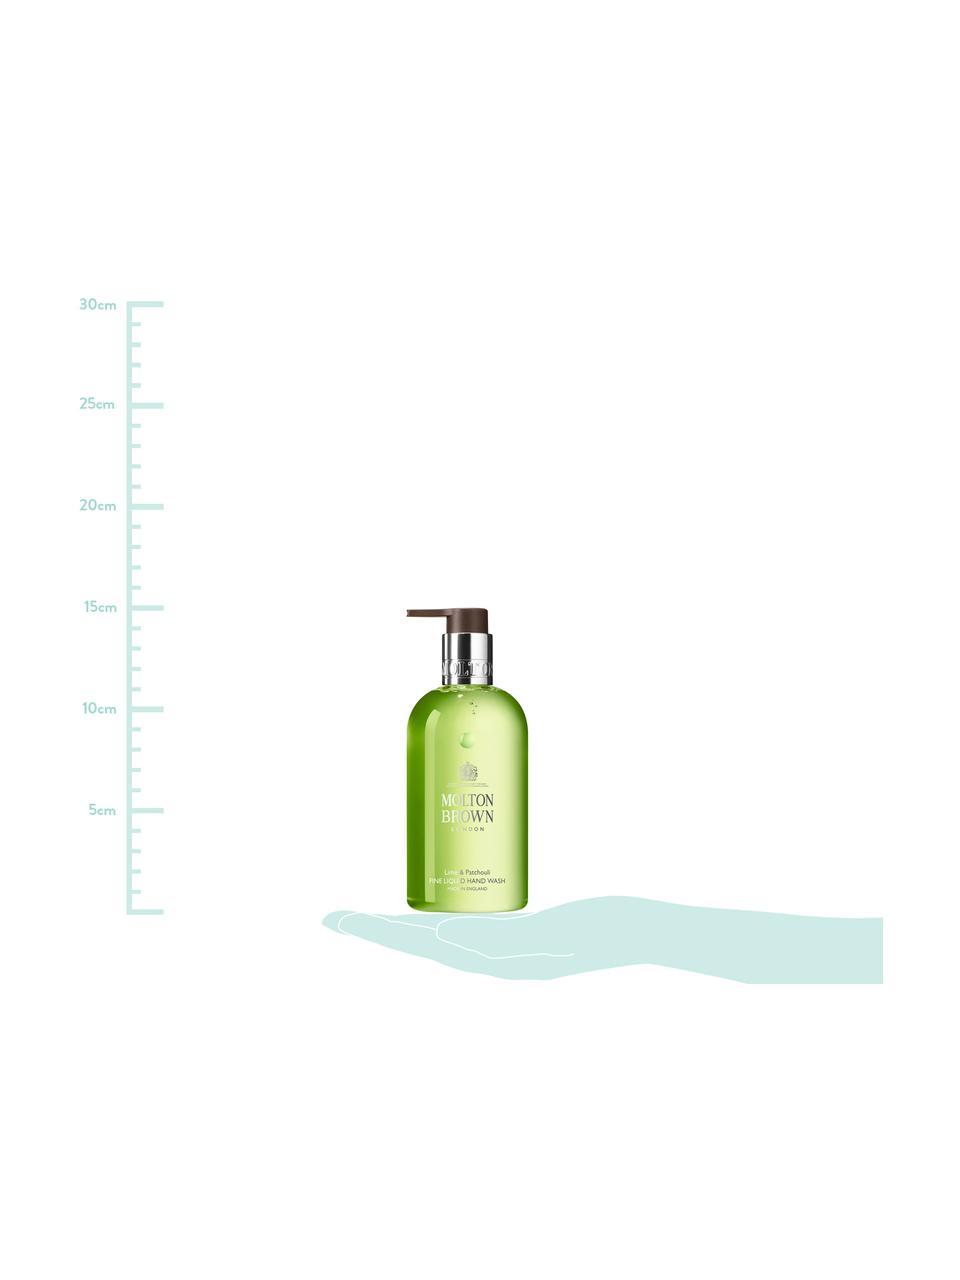 Flüssige Handseife Molton (Limette &  Patschuli), Behälter: Recycelbarer Kunststoff, Grün, Ø 6 x H 15 cm